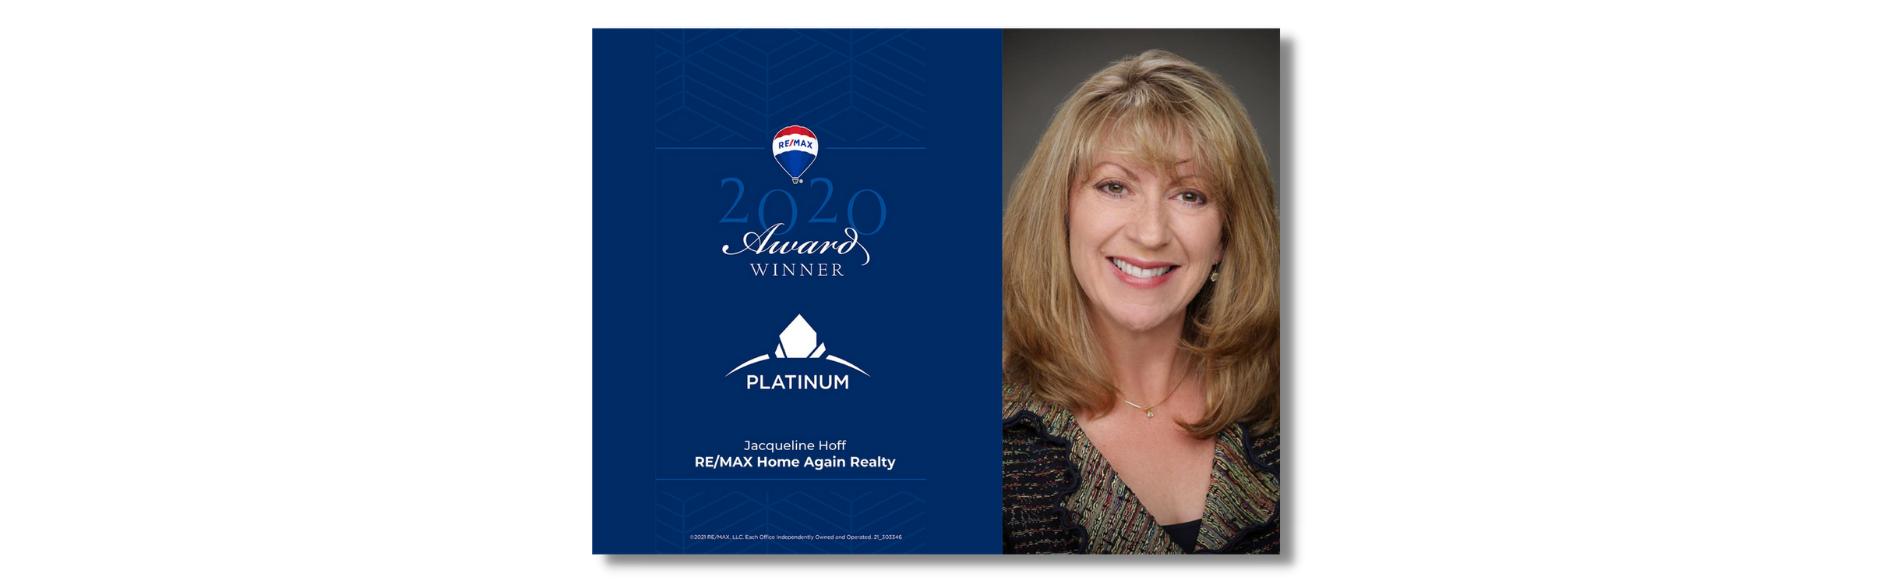 Jaqueline Hoff Montana Realtor Award